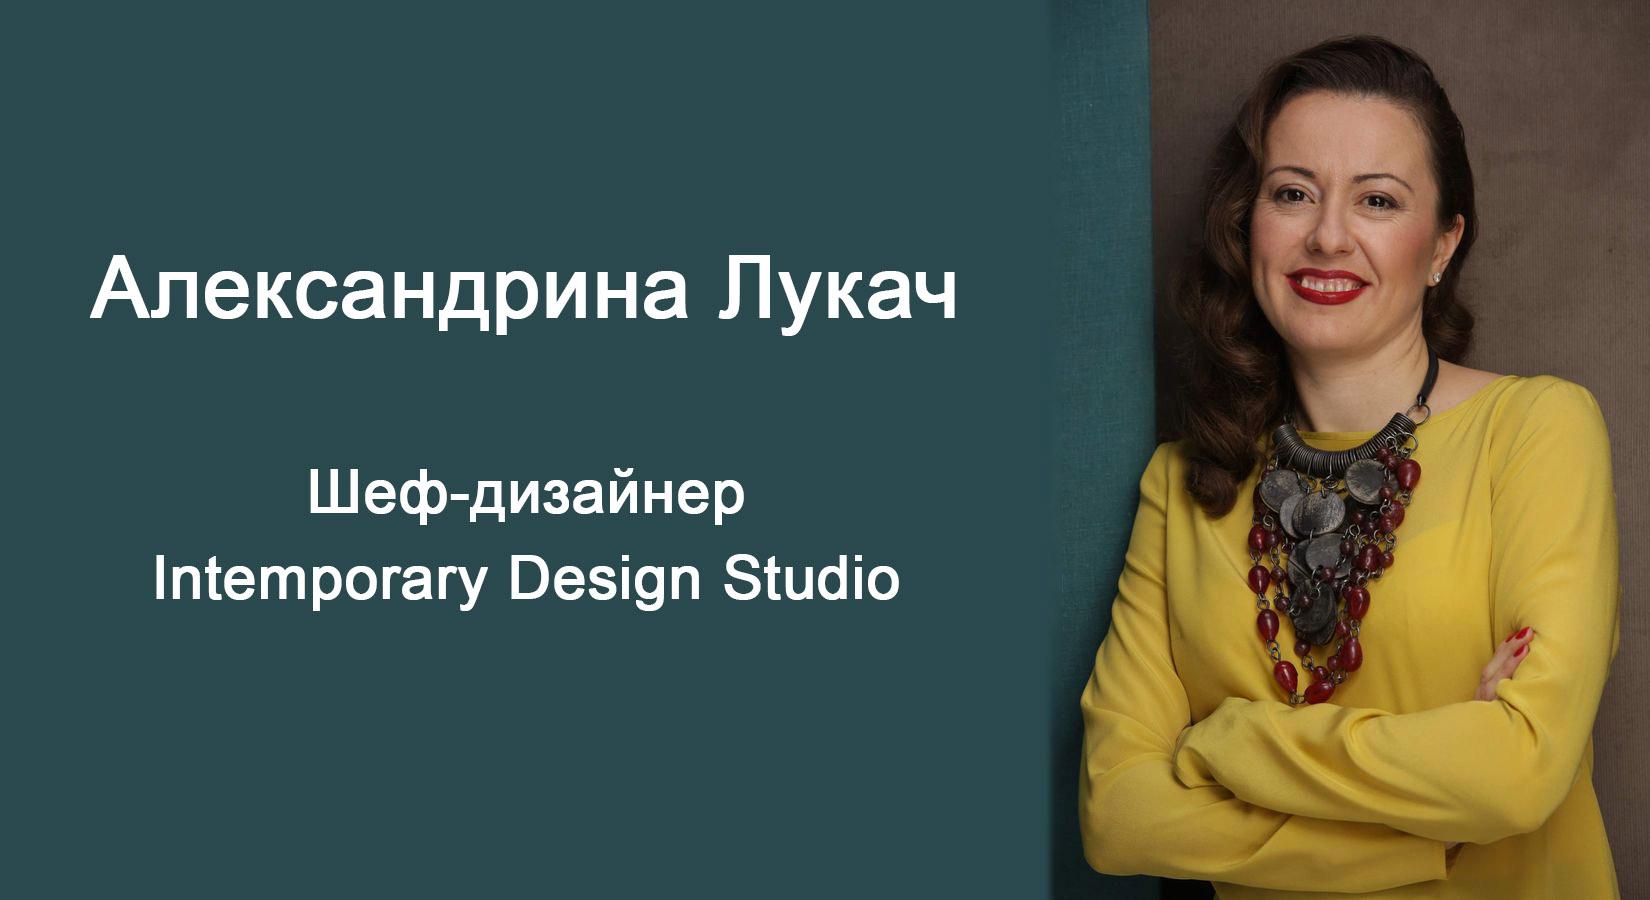 Інтерв'ю Александріни Лукач (Intemporary Design Studio) бренду DAVIS CASA. Частина 1